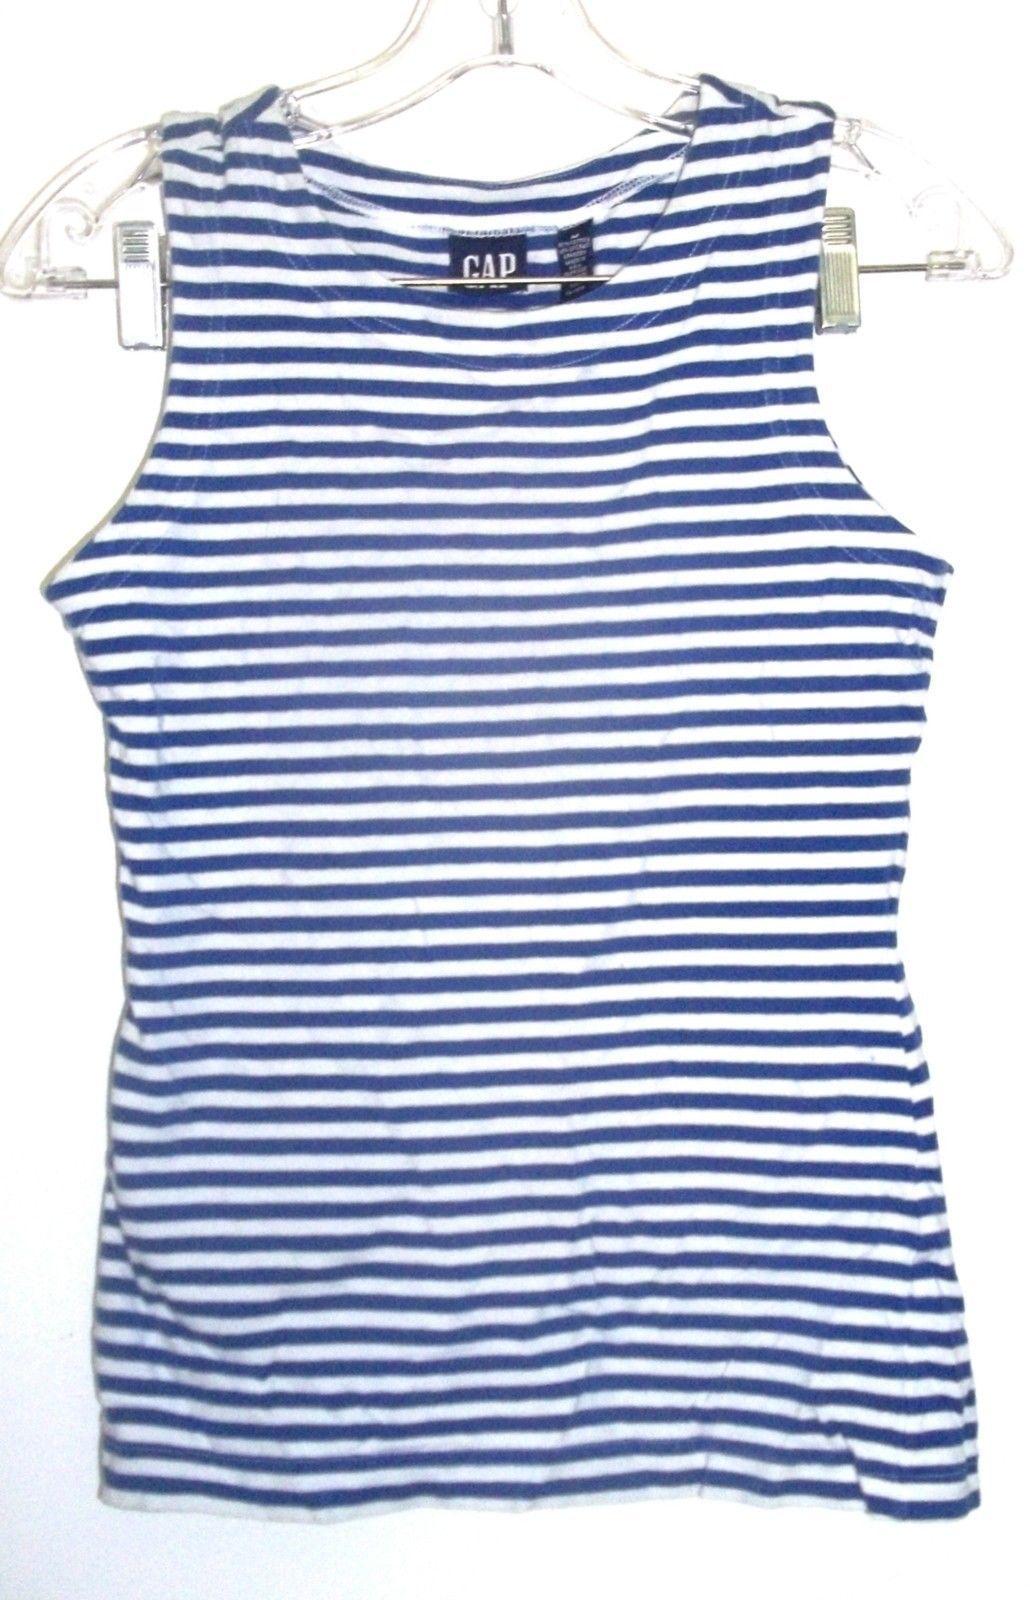 Gap Blue & White Striped Sleeveless Top Cotton Blend Top Sz M - $23.74